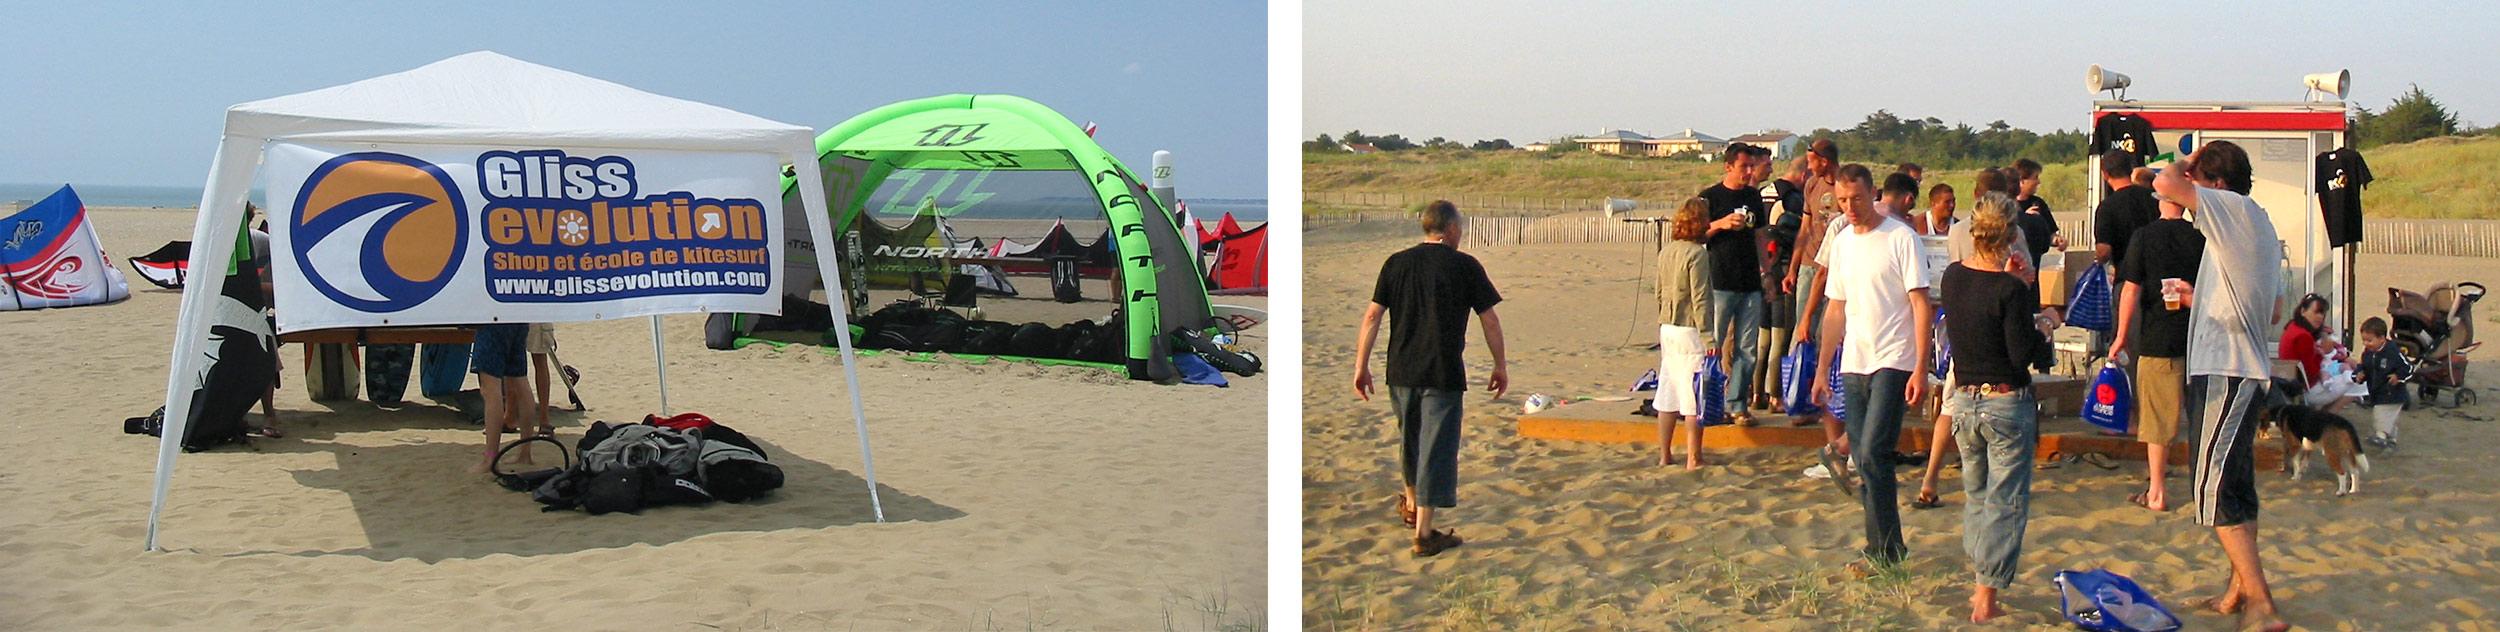 2006-test-shop-magasin-ecole-kitesurf-la-baule-pornichet-saint-brevin-best-kiteboarding